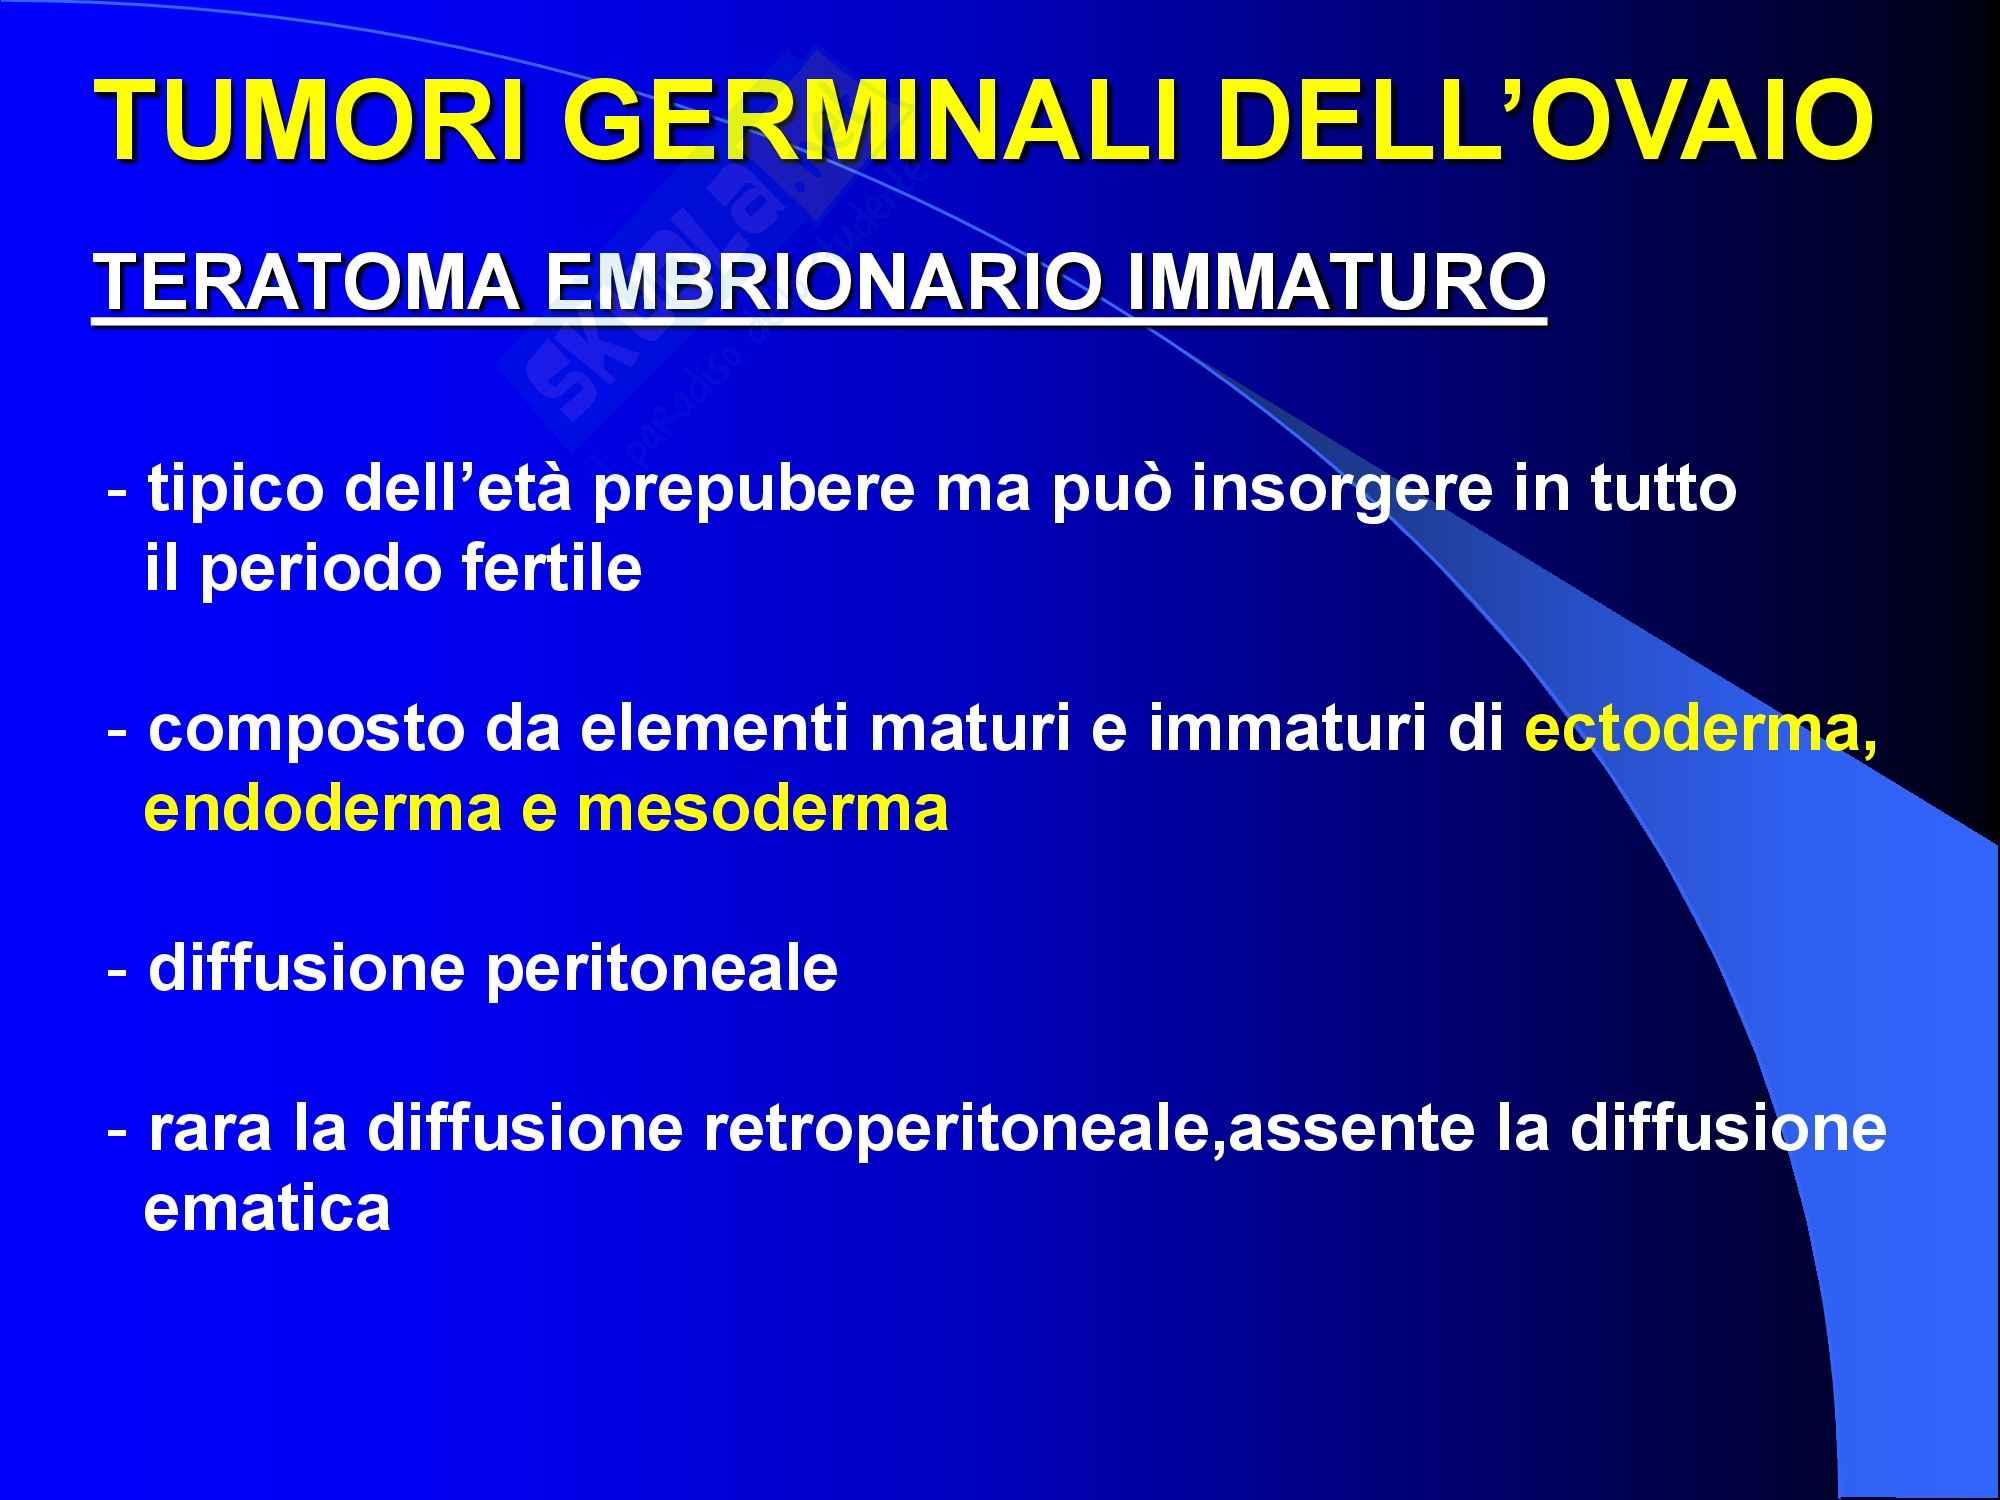 Ginecologia e Ostetricia - Neoplasie germinali ovariche Pag. 21